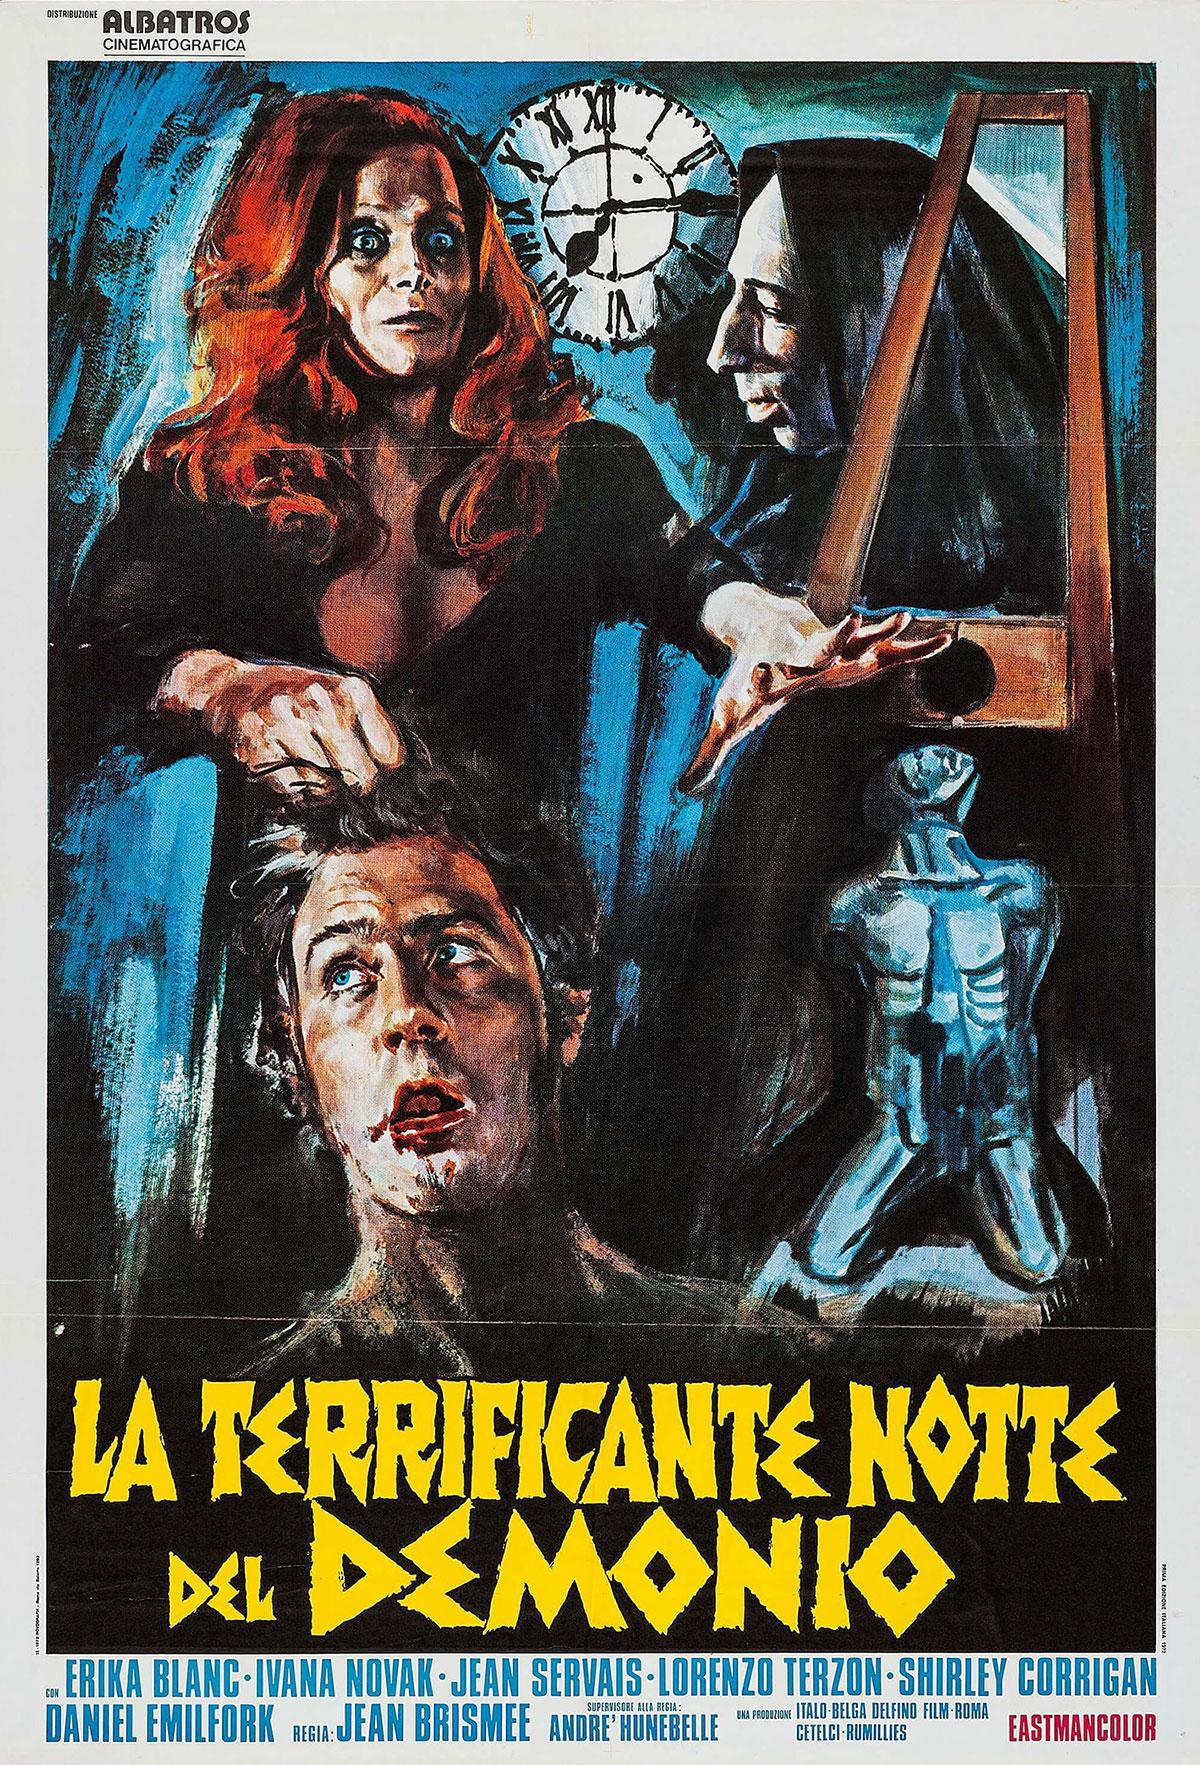 The Devil's Nightmare movie poster in Italian